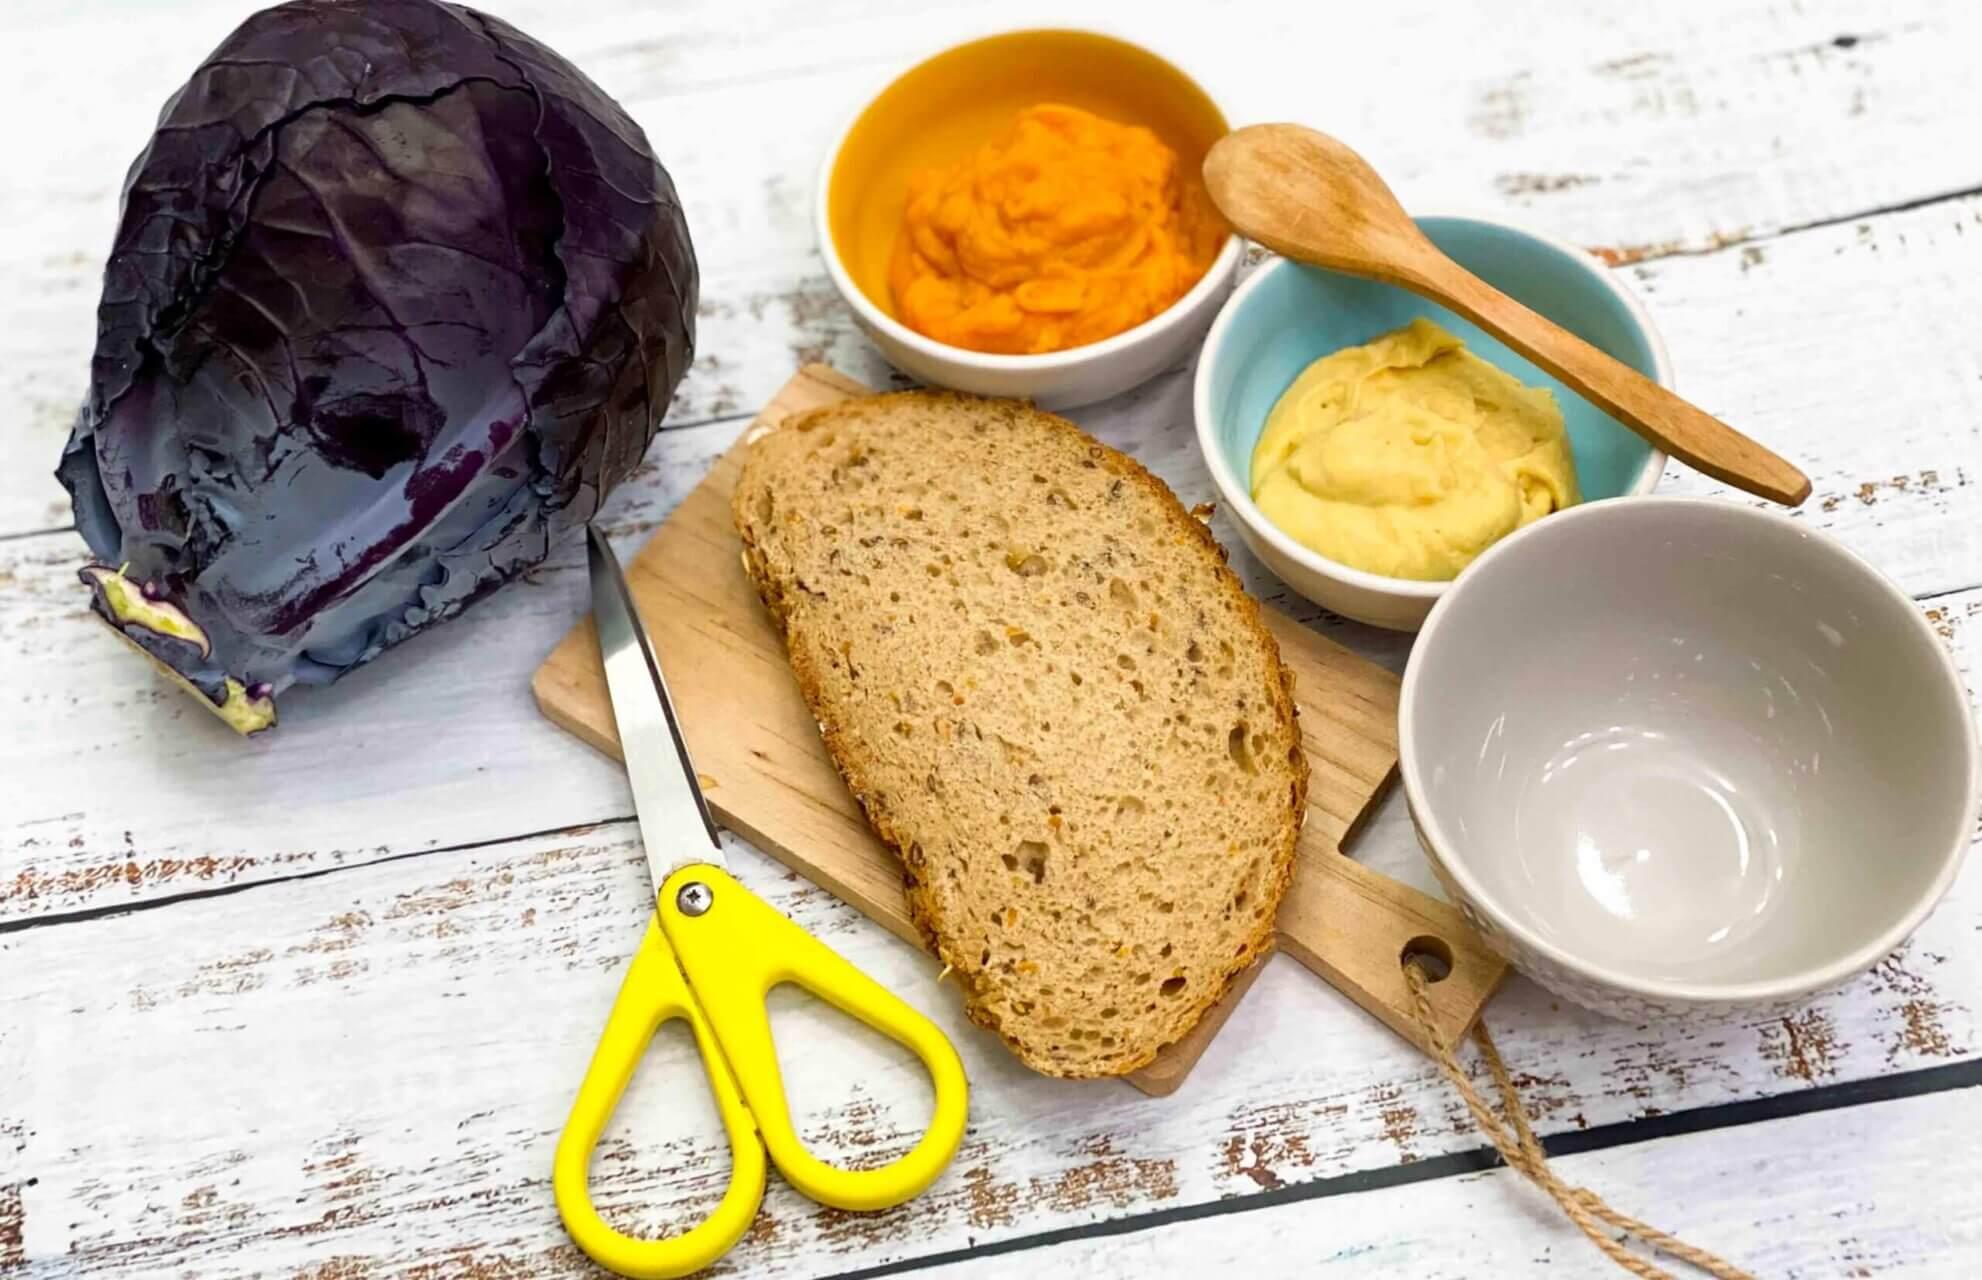 lisica, klub zdravih navika, kzn, lisica klub zdravih navika, lisica kzn, formiranje sendvica u obliku lisice, uzina, humus namaz, namaz od humusa, iceberg salat centar